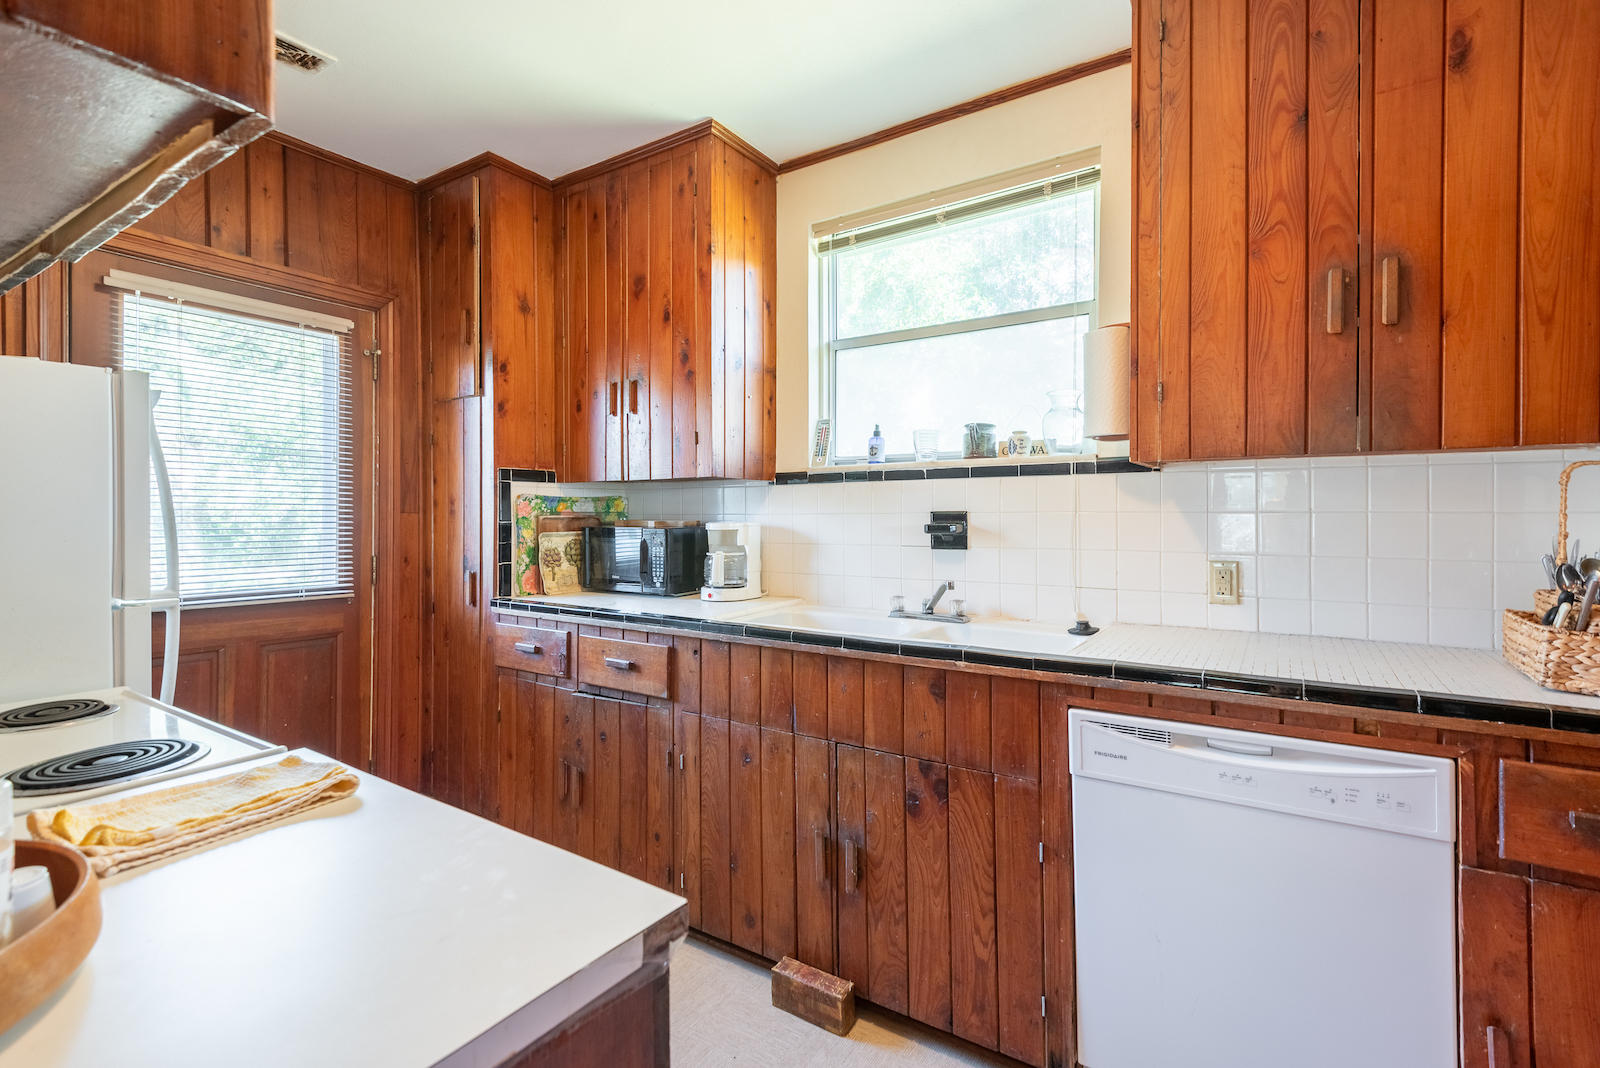 Sullivans Island Homes For Sale - 2525 Atlantic, Sullivans Island, SC - 18